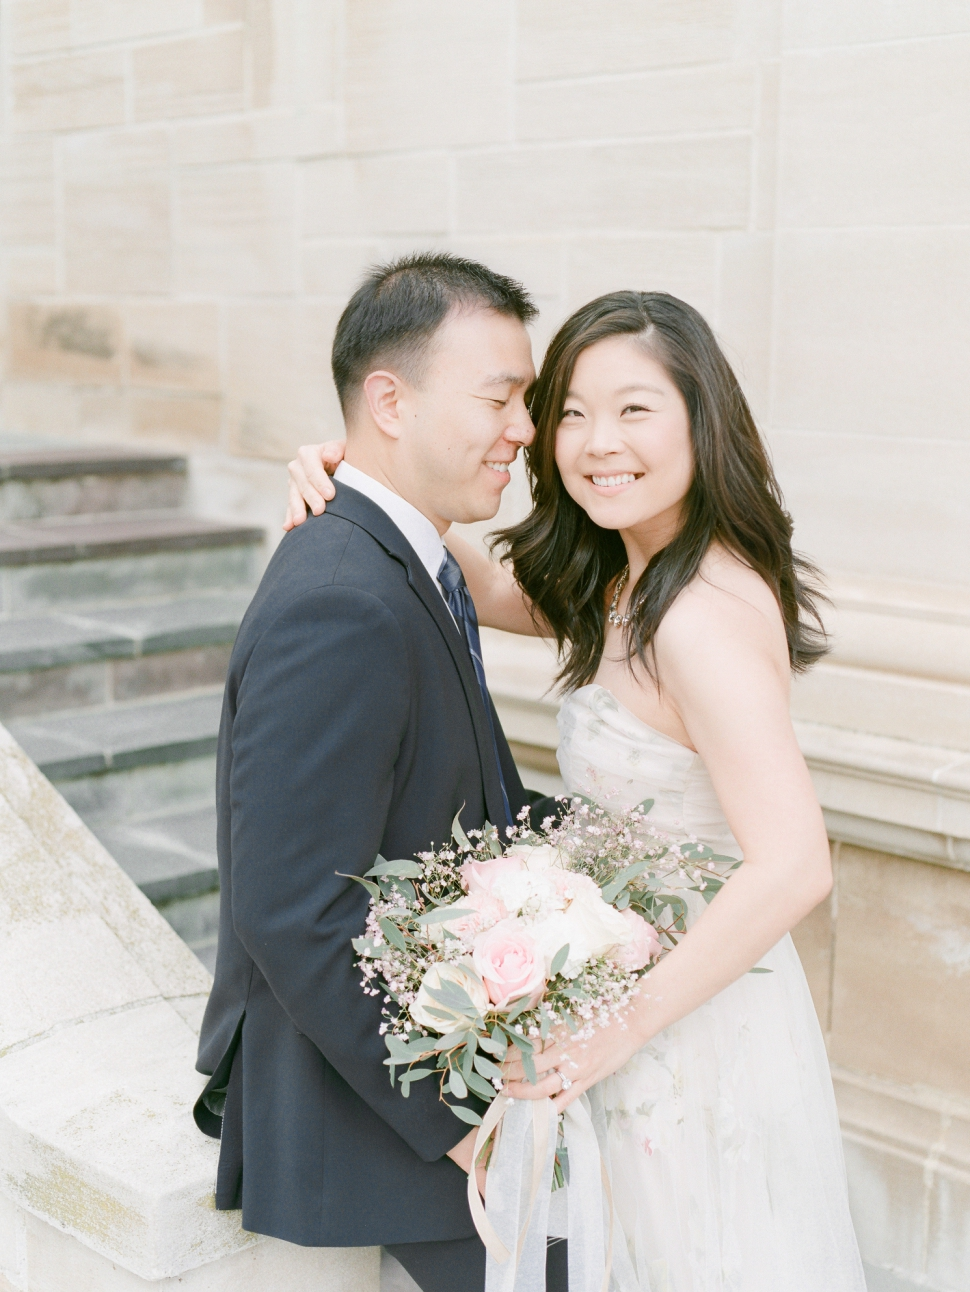 Southern-California-Wedding-Photographer-Cassi-Claire-Greystone-Mansion-Beverly-Hills-CA-wedding_19.jpg